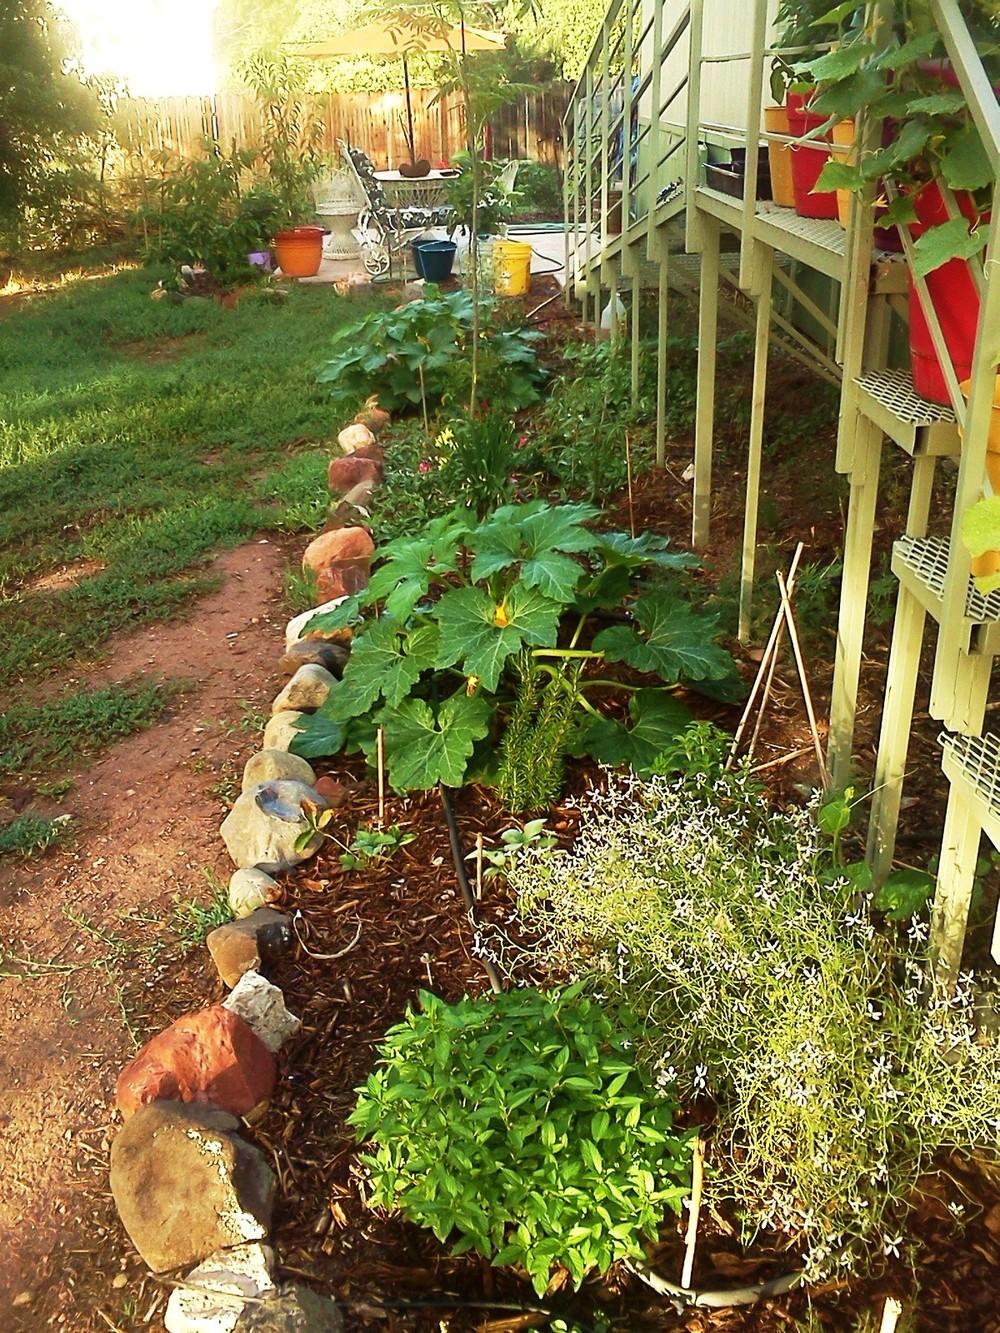 garden July 2015 005.jpg